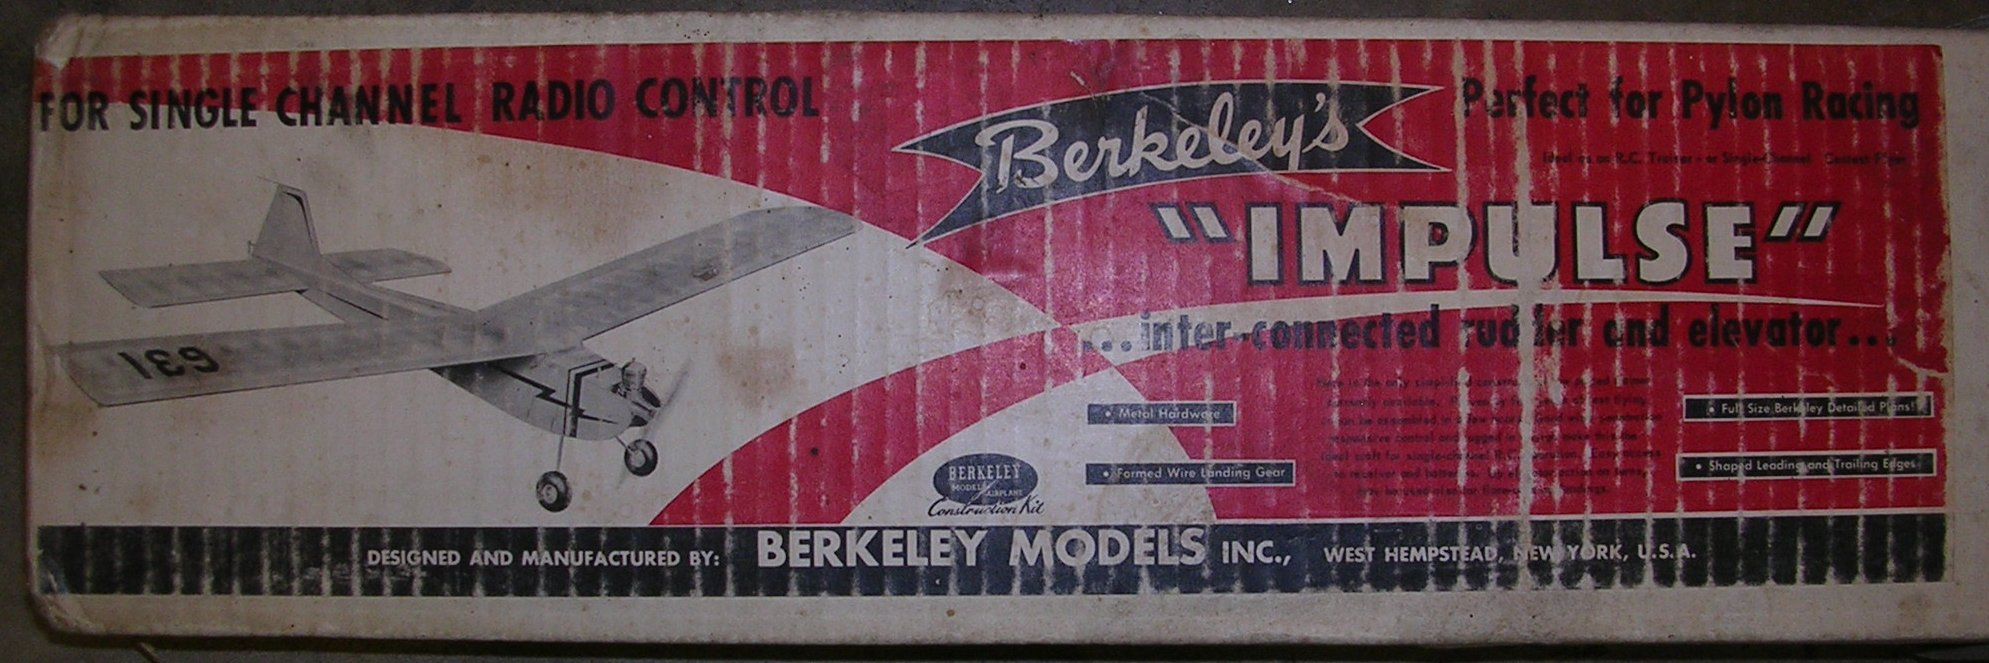 Click image for larger version  Name:Berkeley Impulse Box Art.jpg Views:212 Size:246.8 KB ID:1972328